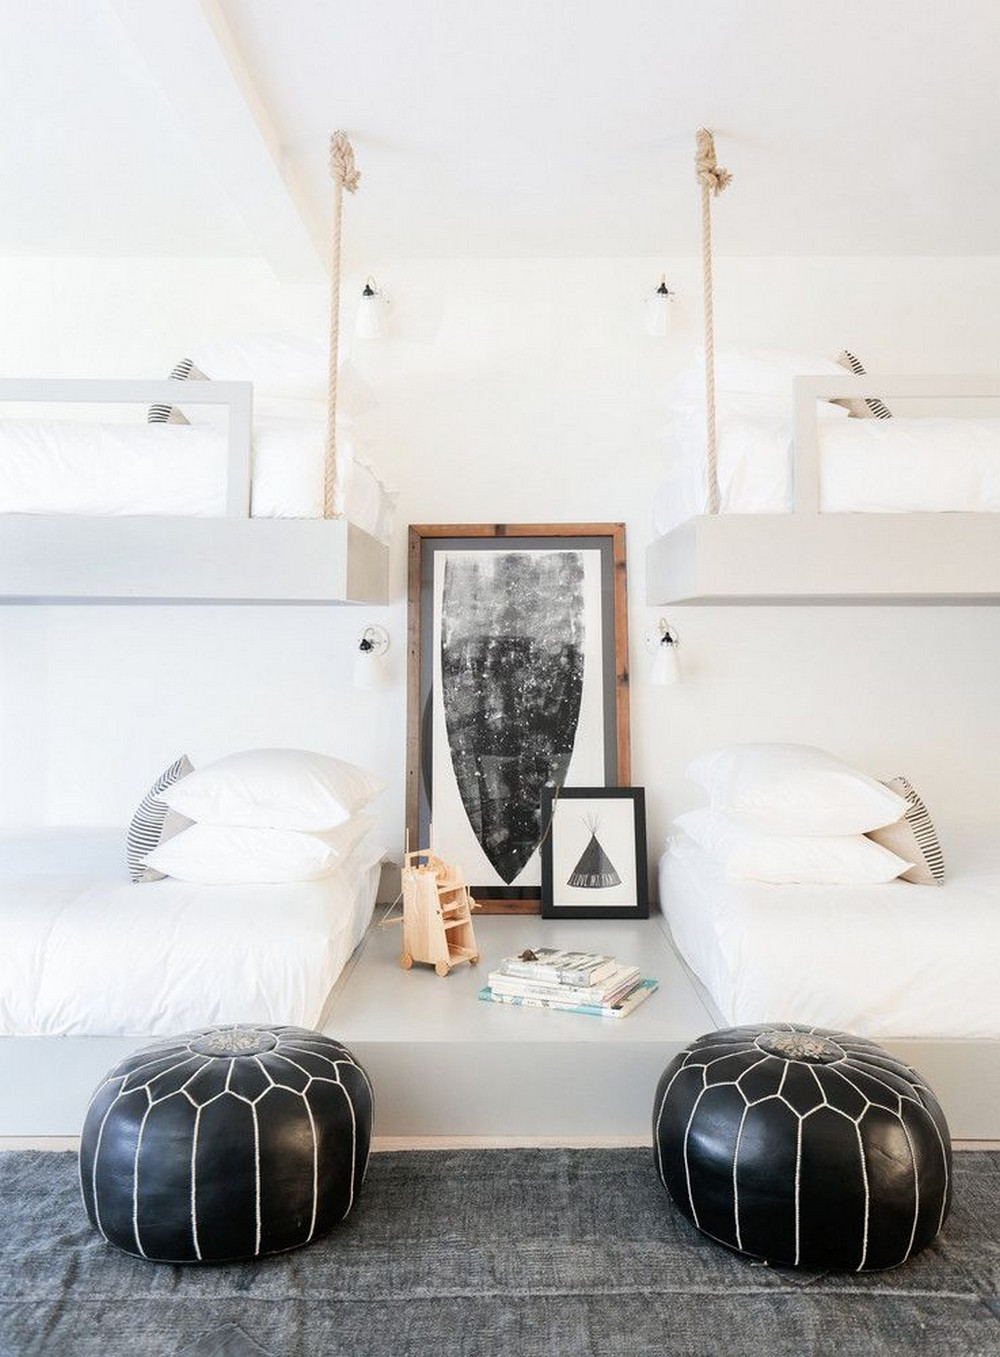 Decoration Ideas Discover Phenomenal Interiors with a Coastal Style 5 decoration ideas Decoration Ideas: Discover Phenomenal Interiors with a Coastal Style Decoration Ideas Discover Phenomenal Interiors with a Coastal Style 5